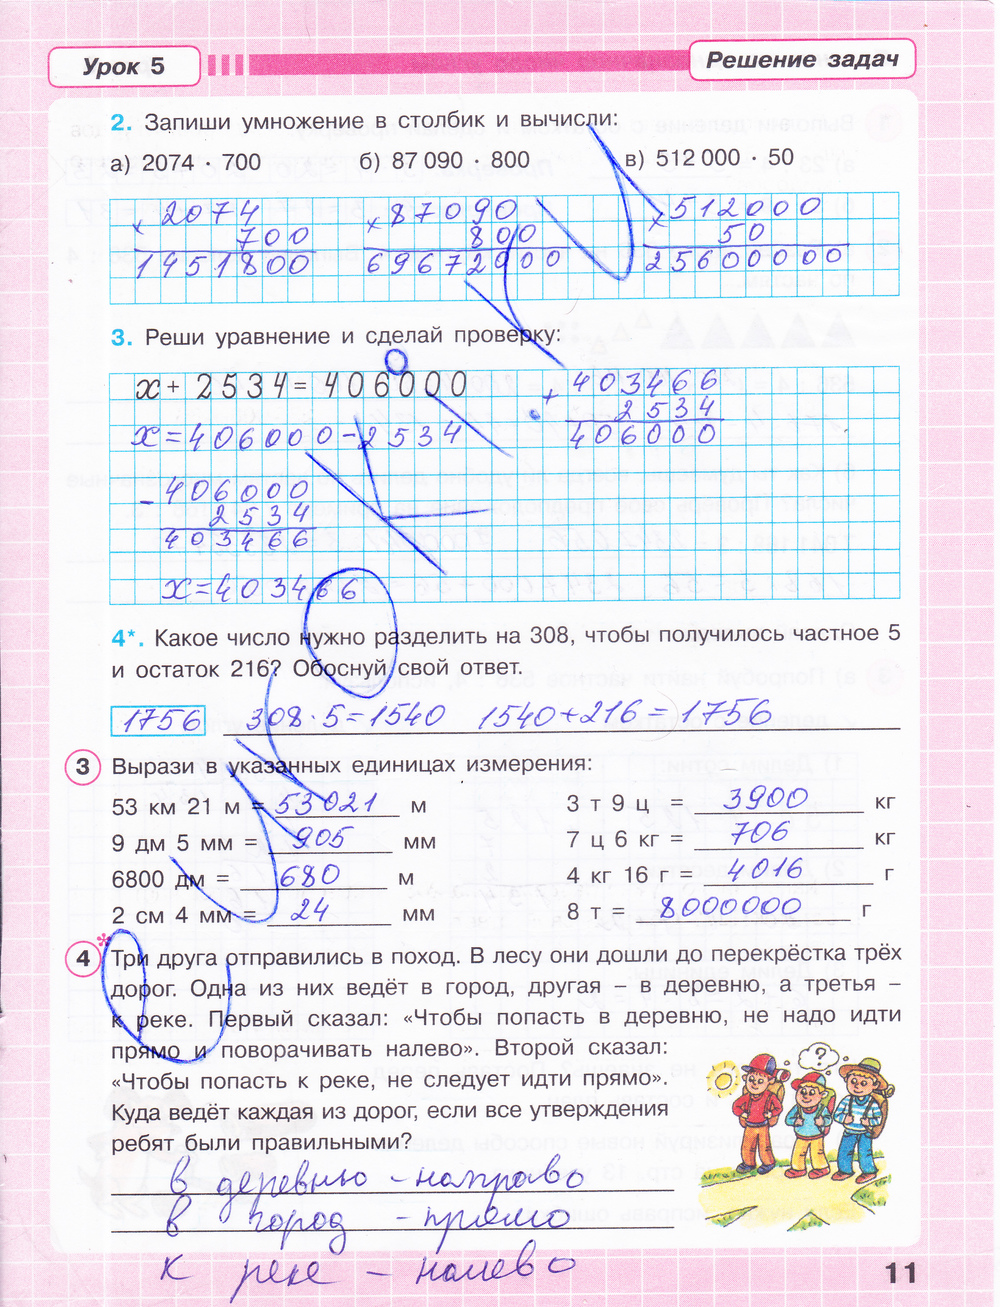 питерсон 3 класс рабочая тетрадь математика